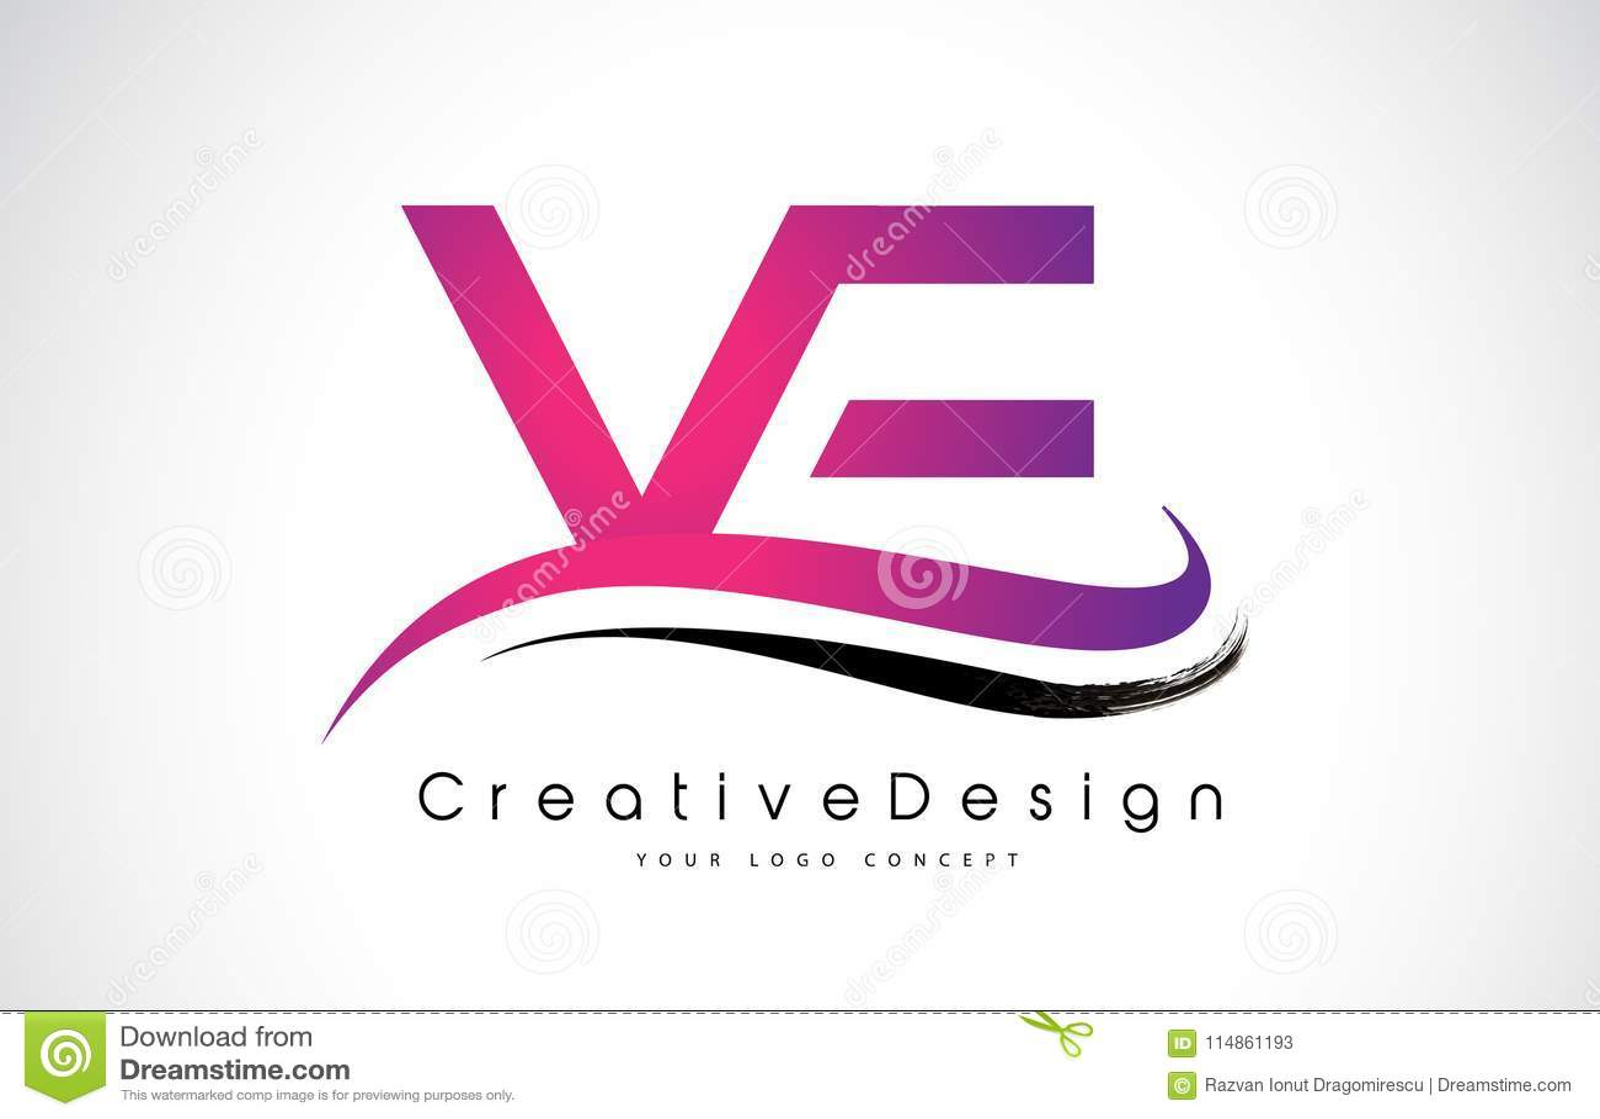 VE V E Letter Logo Design. Creative Icon Modern Letters Vector L ...